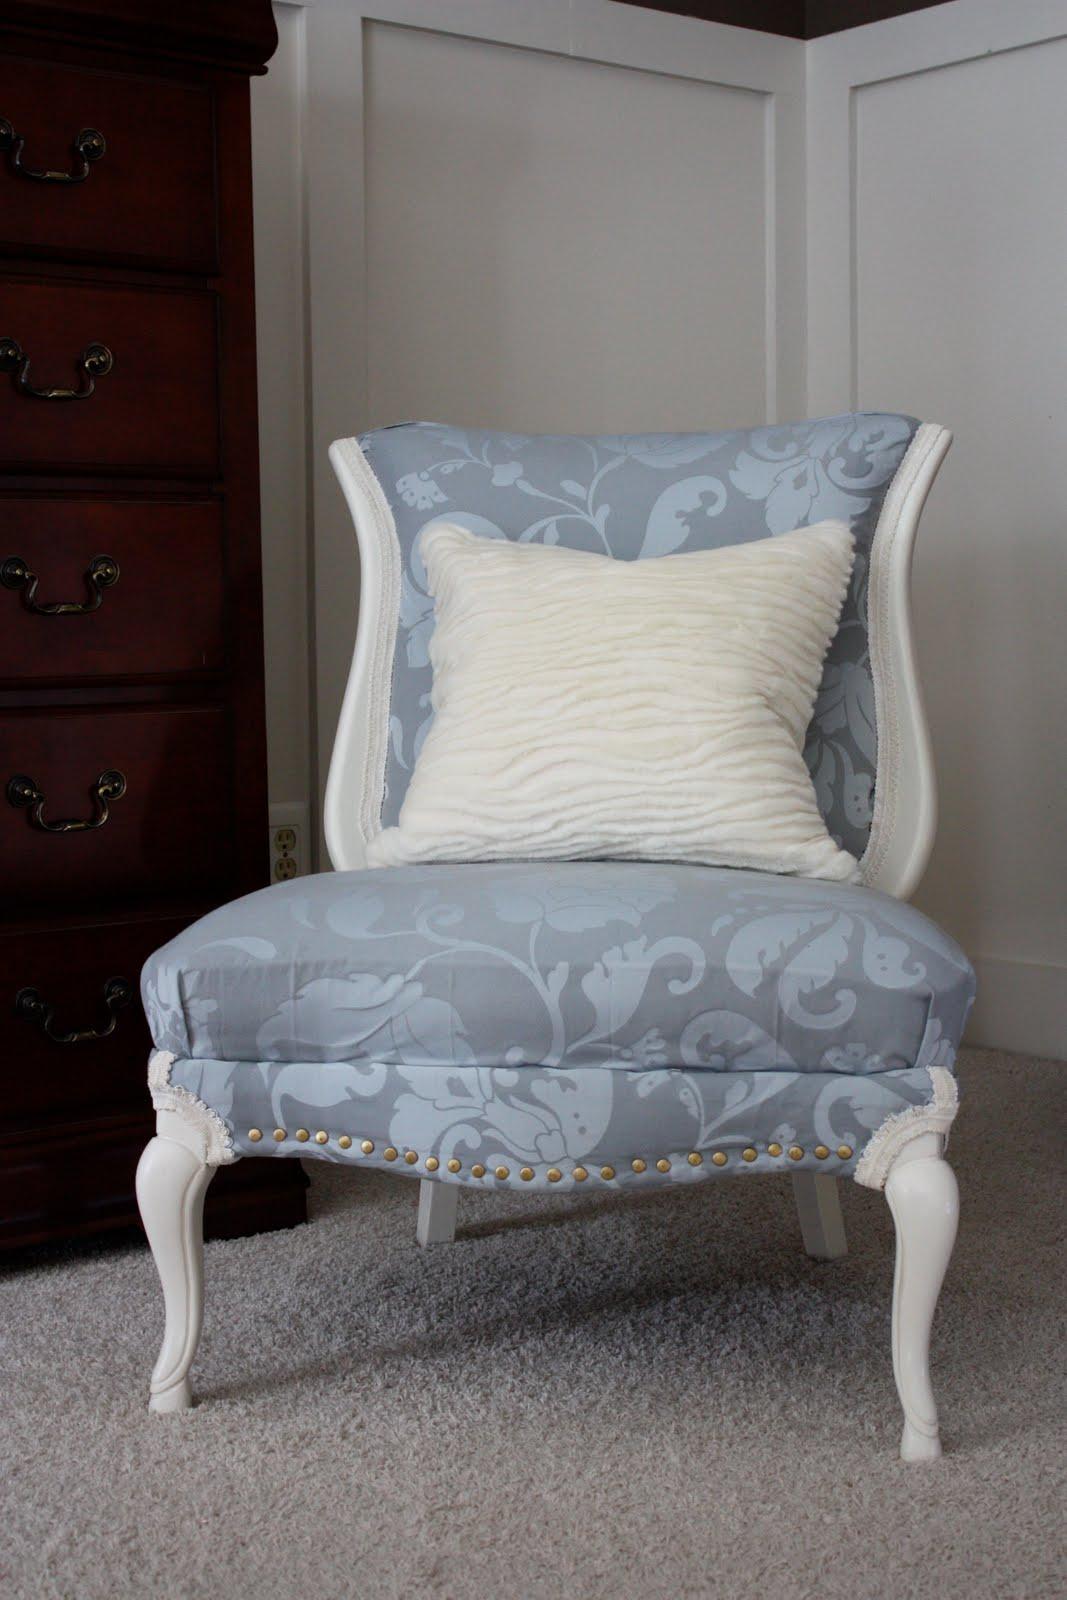 Antique slipper chair - Vintage Slipper Chair